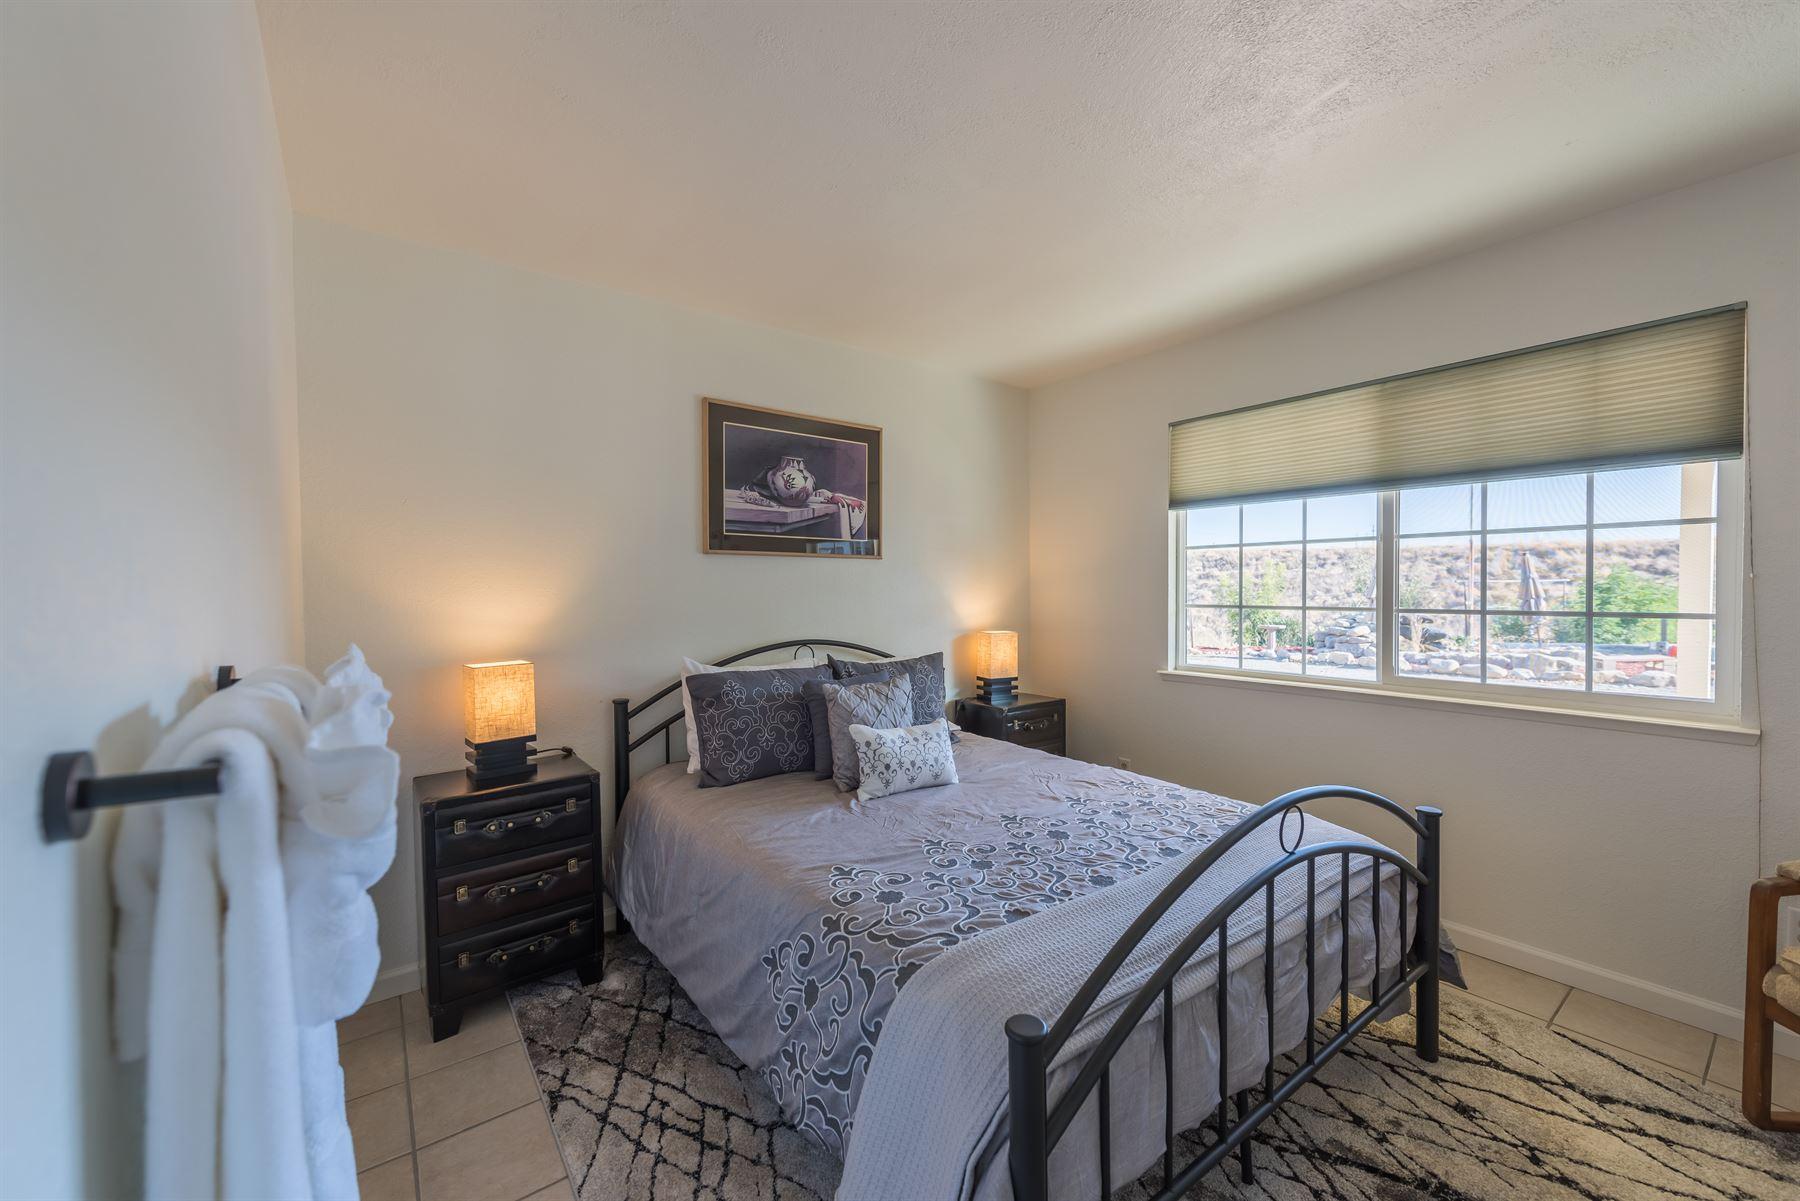 Oak Pass Ranch - Interior - Bedroom with grey linens